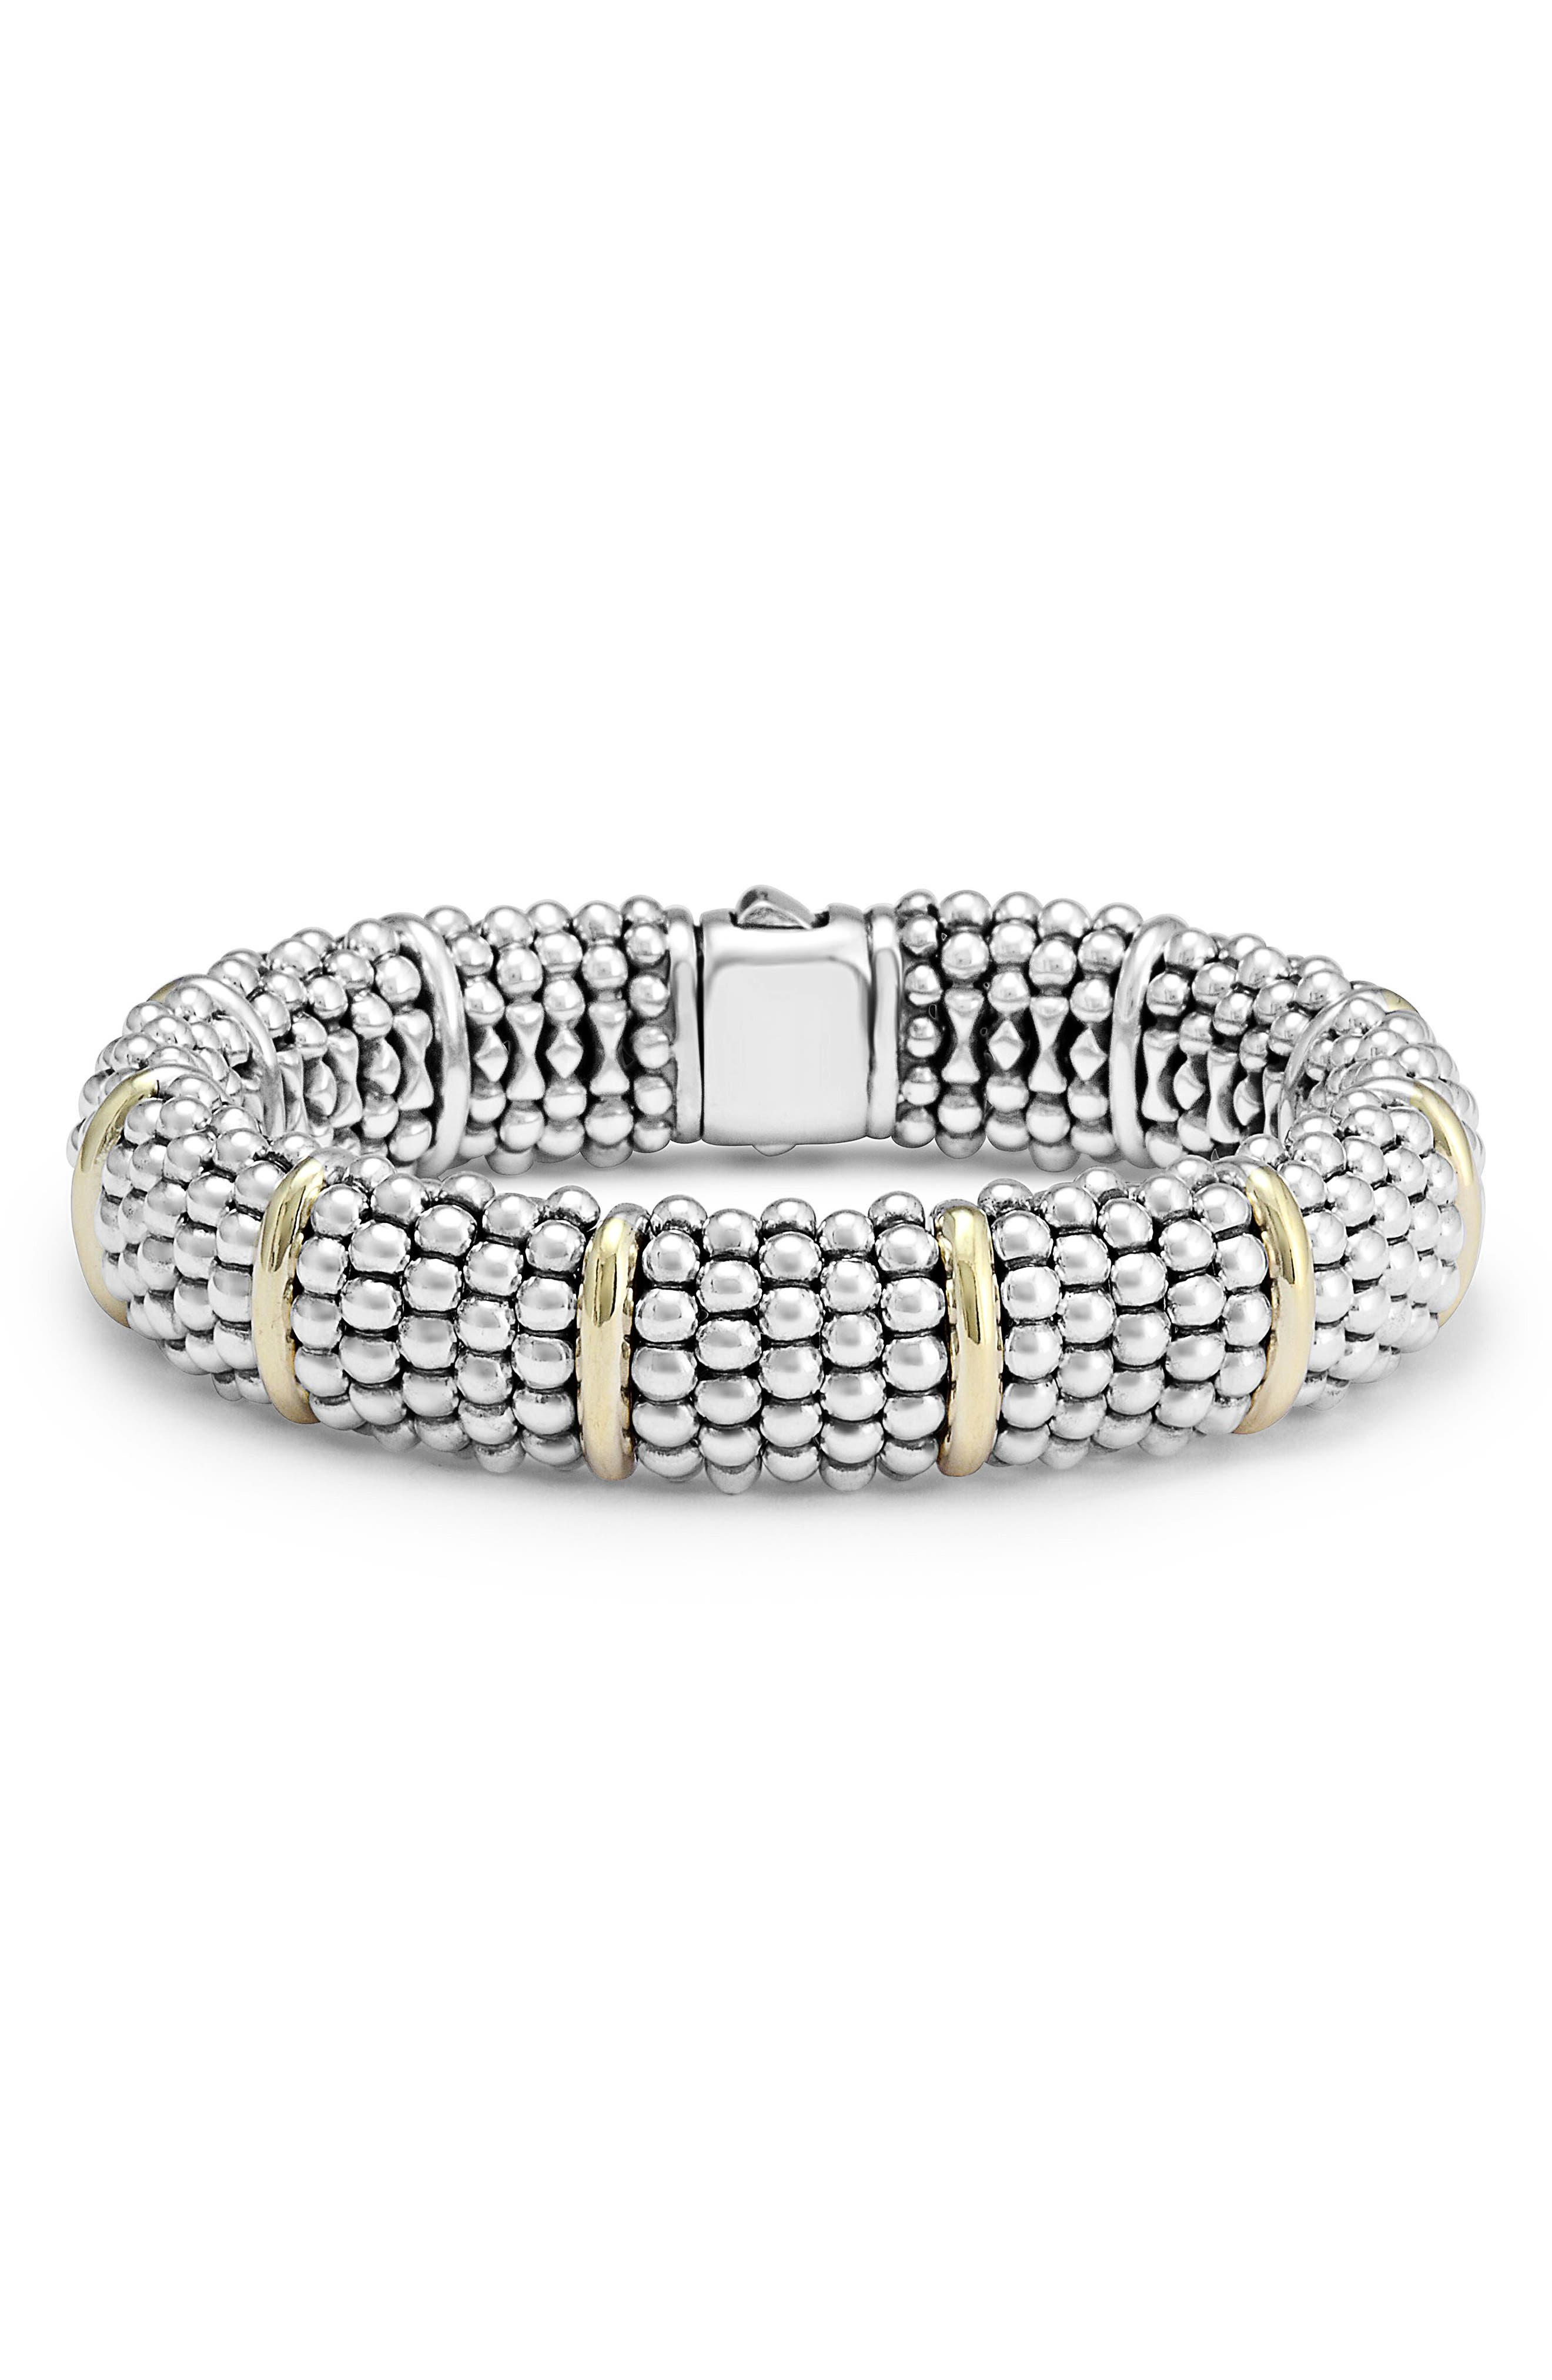 Oval Caviar Bracelet,                             Main thumbnail 1, color,                             Silver/ Gold